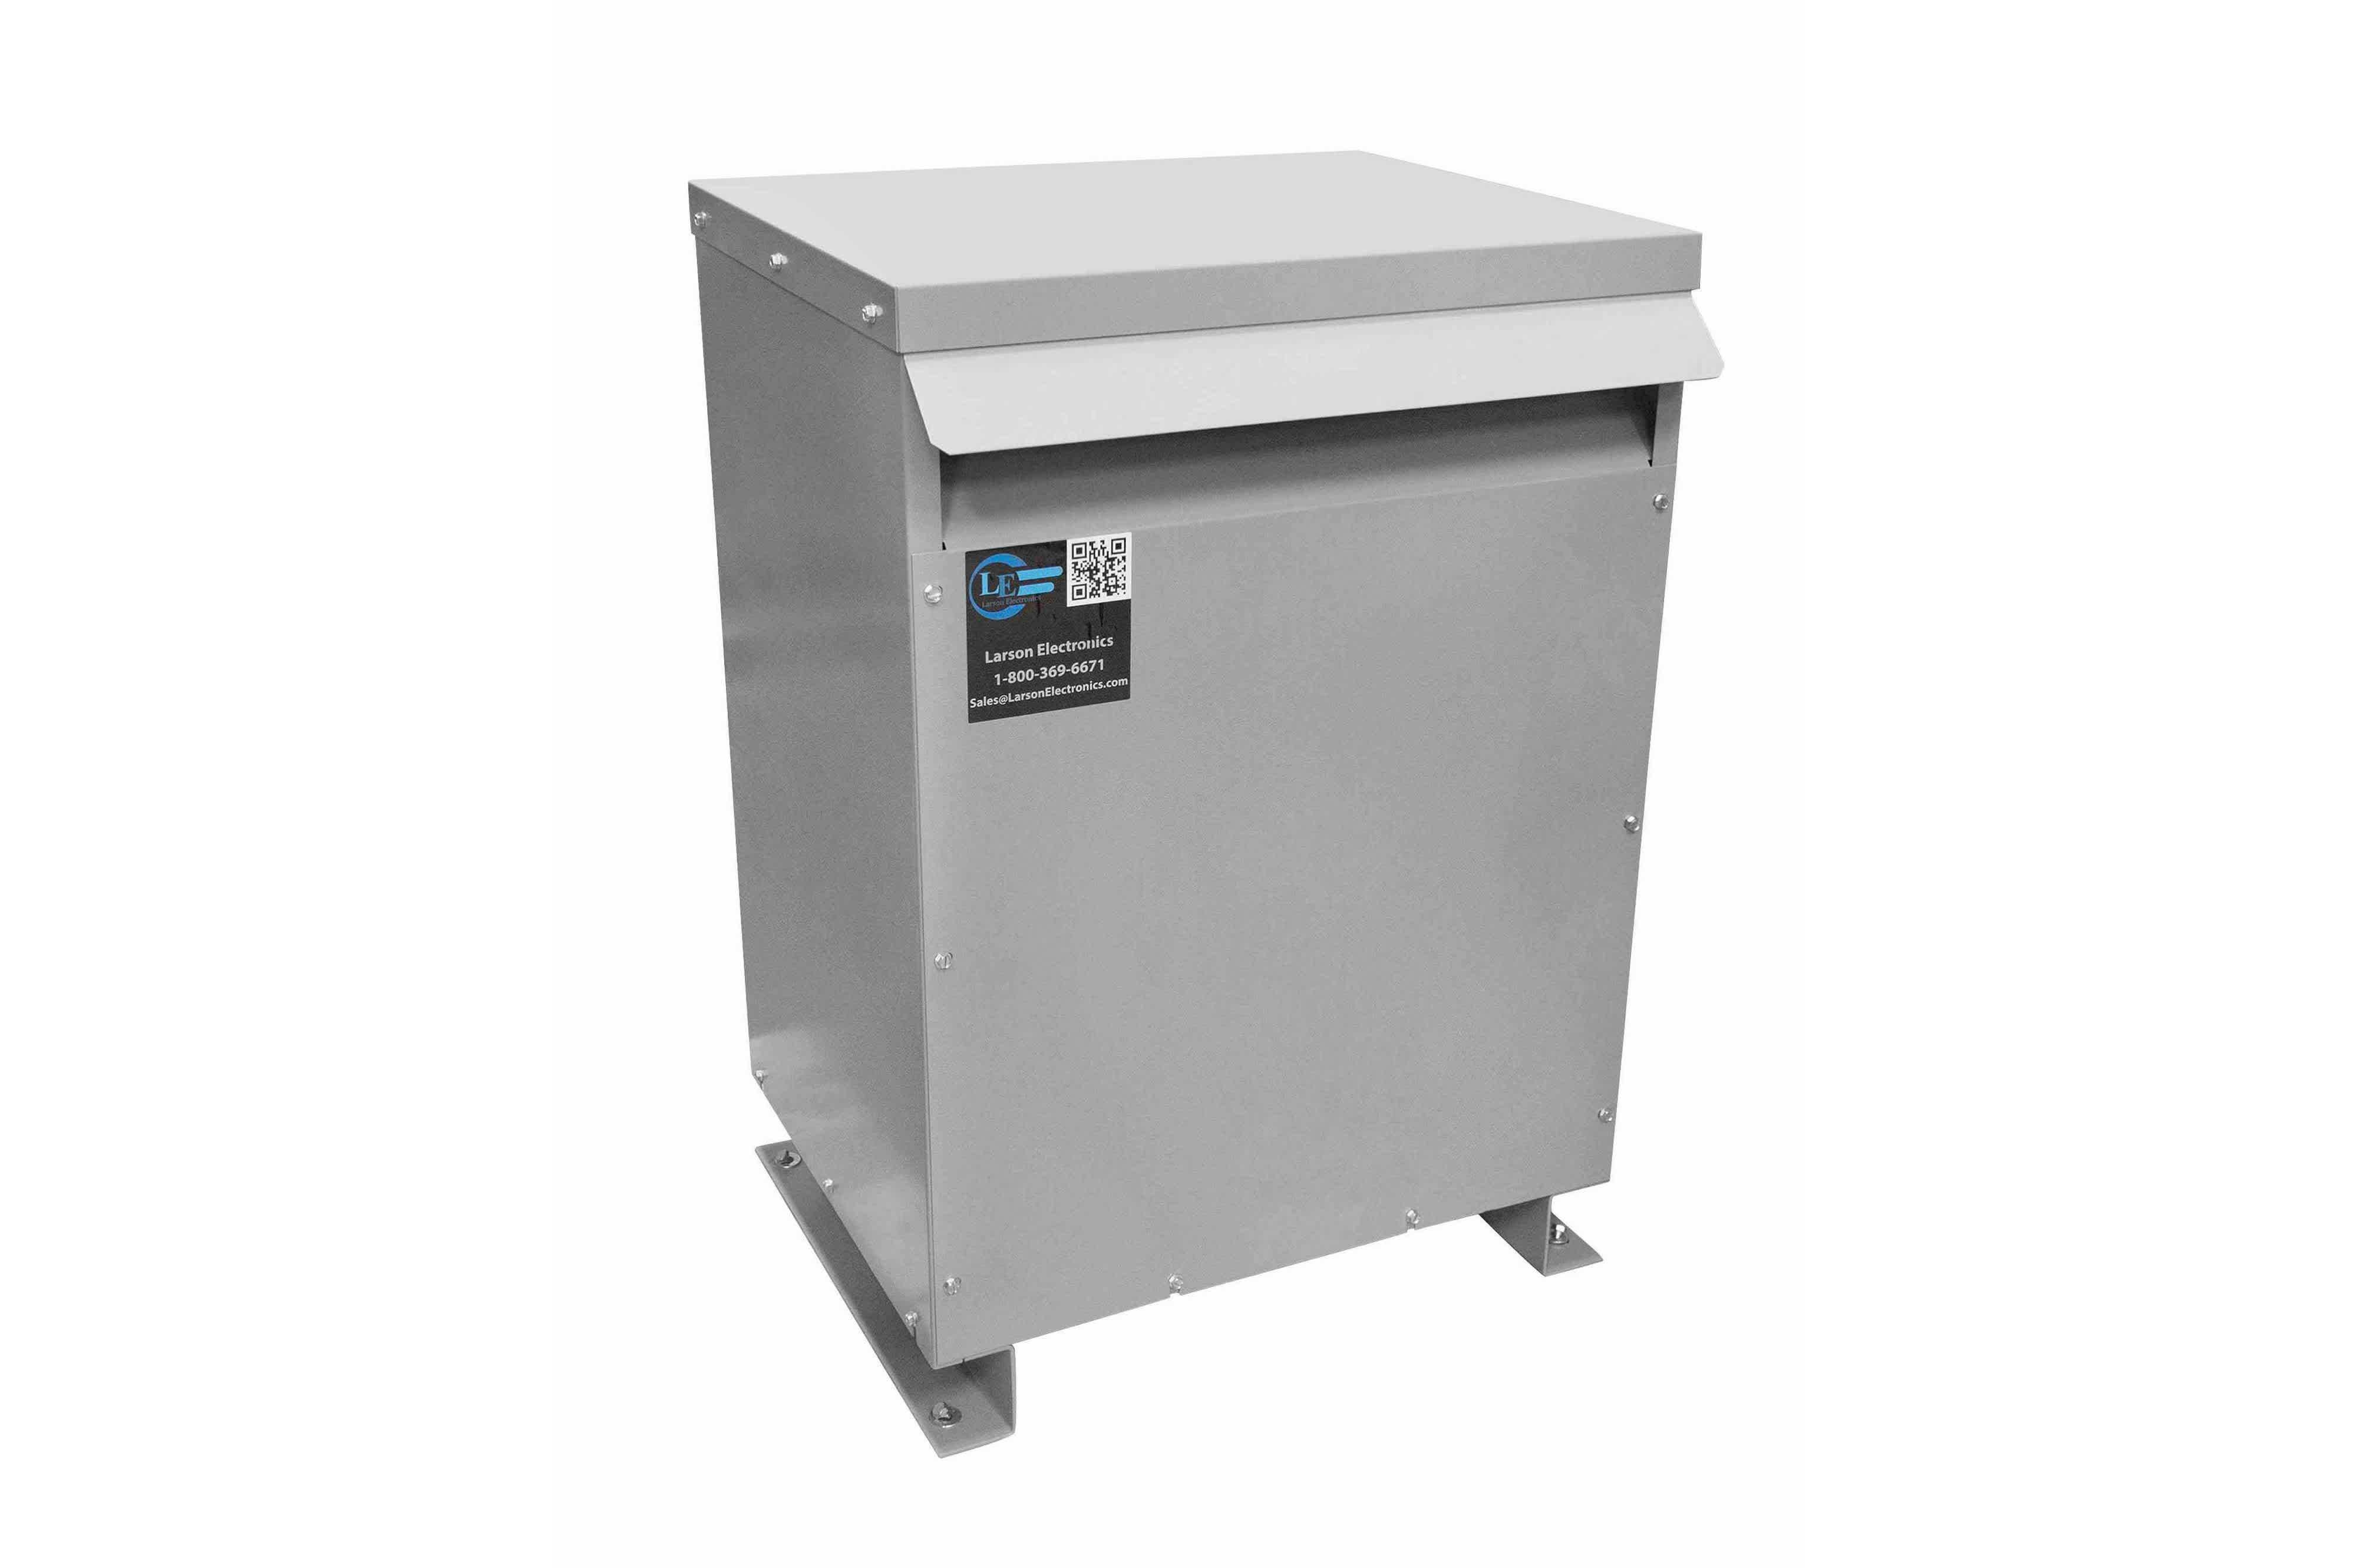 36 kVA 3PH DOE Transformer, 240V Delta Primary, 208Y/120 Wye-N Secondary, N3R, Ventilated, 60 Hz